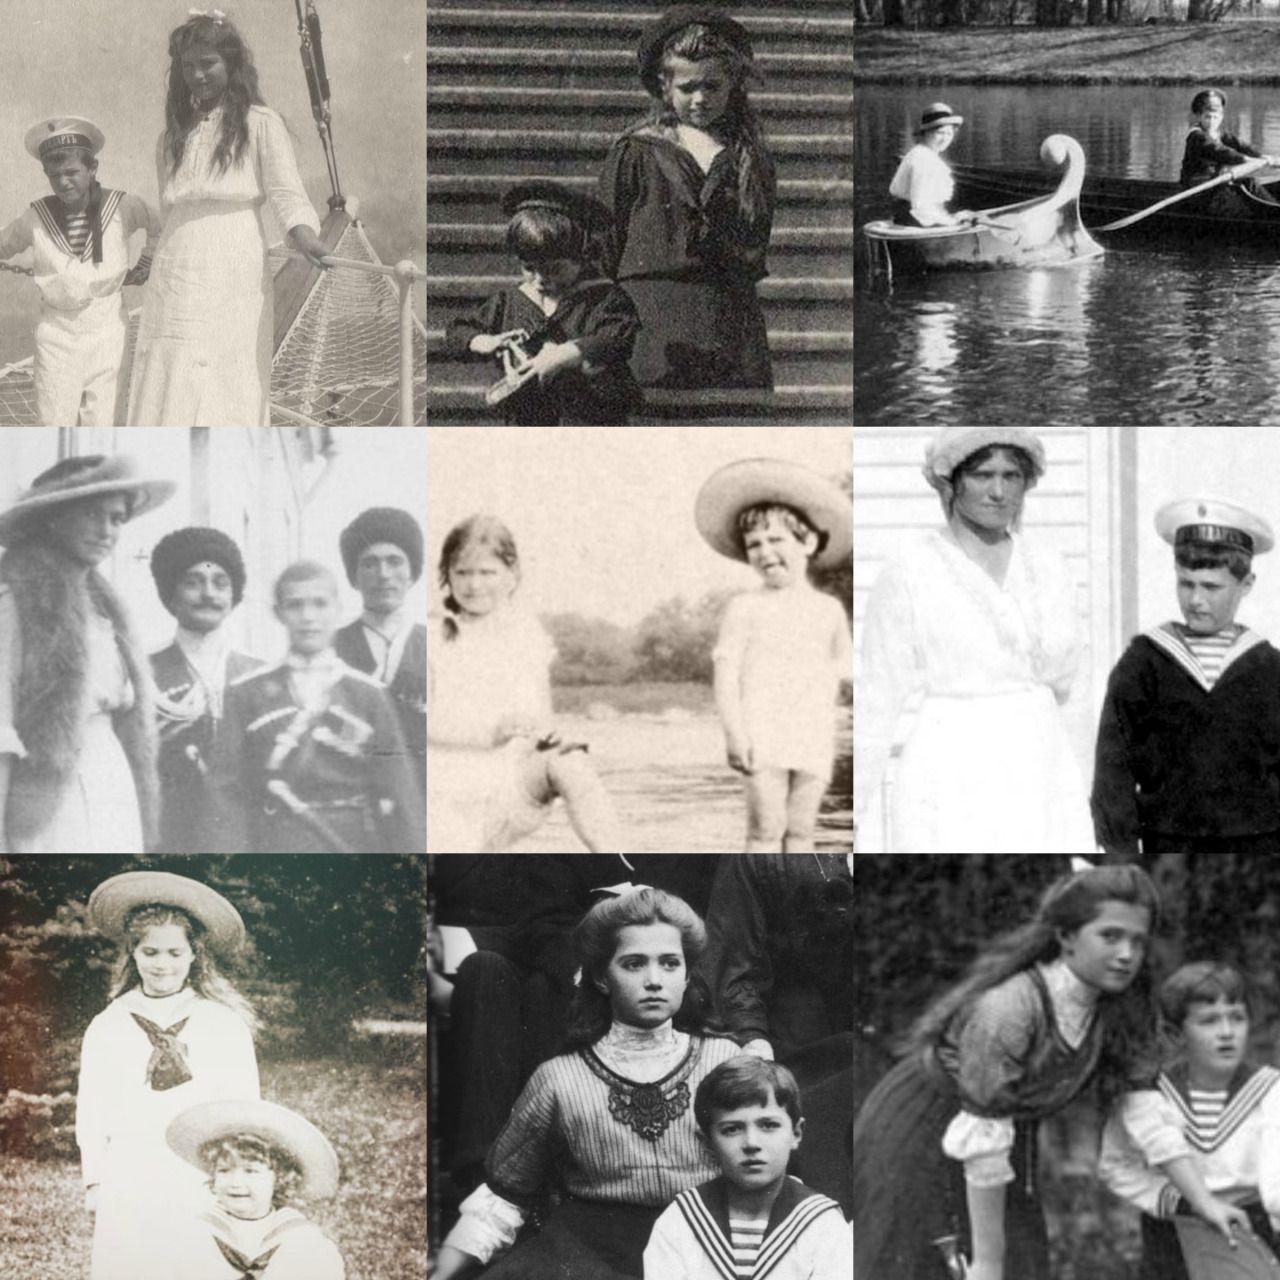 Grand Duchess Maria Nikolaevna (1899-1918) with her little brother Tsarevich Alexei Nikolaevich (1904-1918)